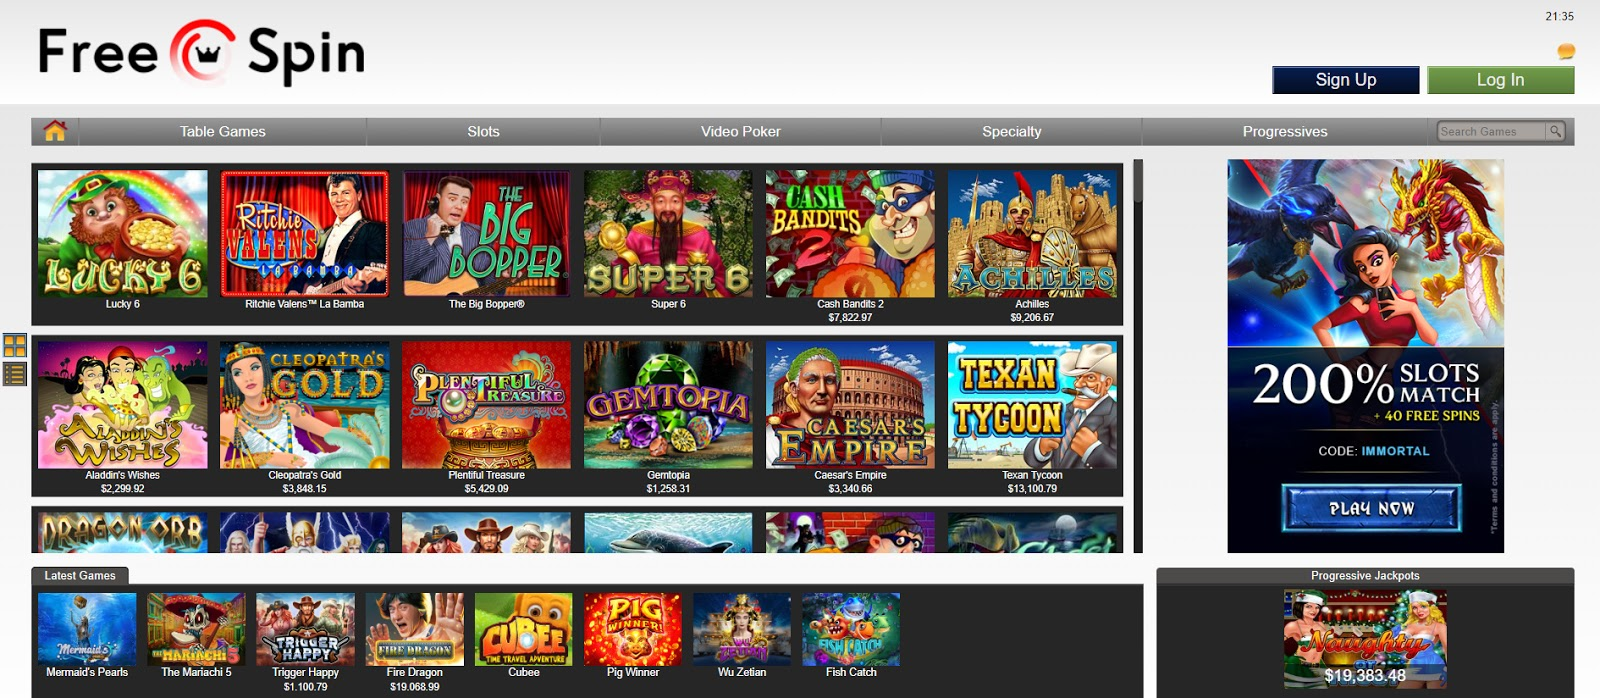 Freespin casino